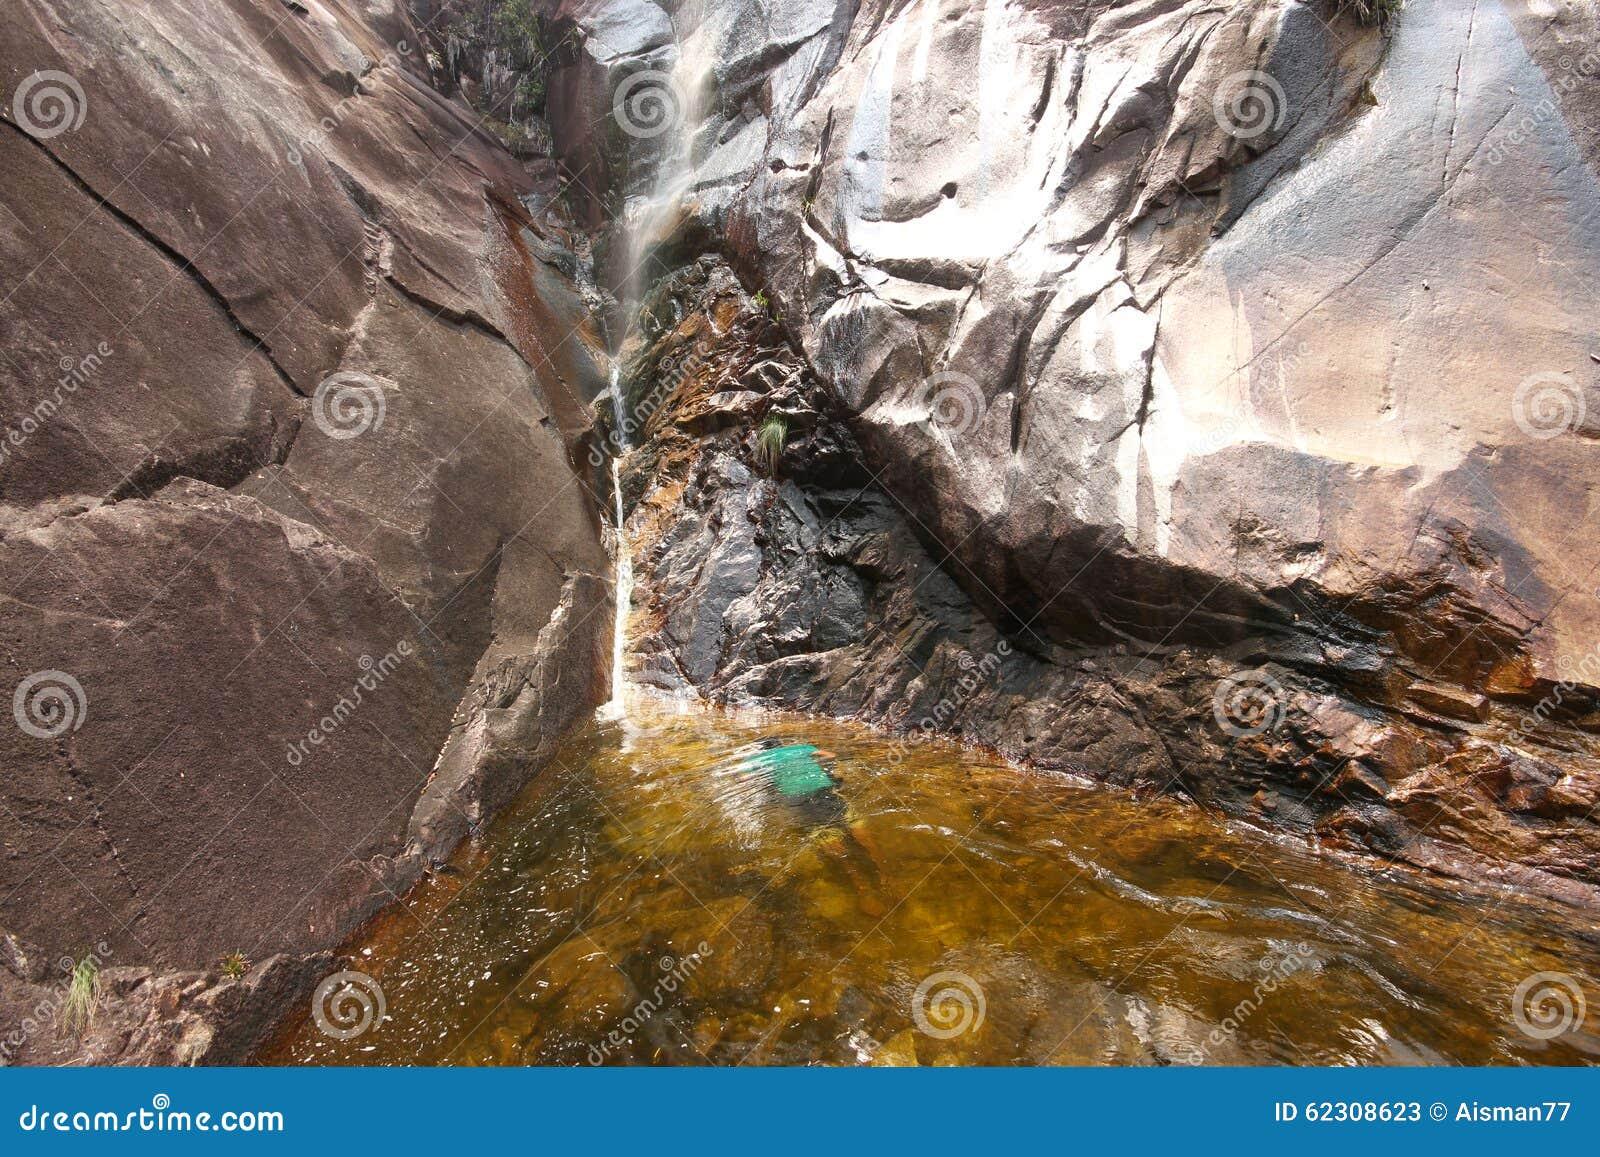 Paisaje hermoso de la cascada de Apong Jatuh en Gunung Ledang